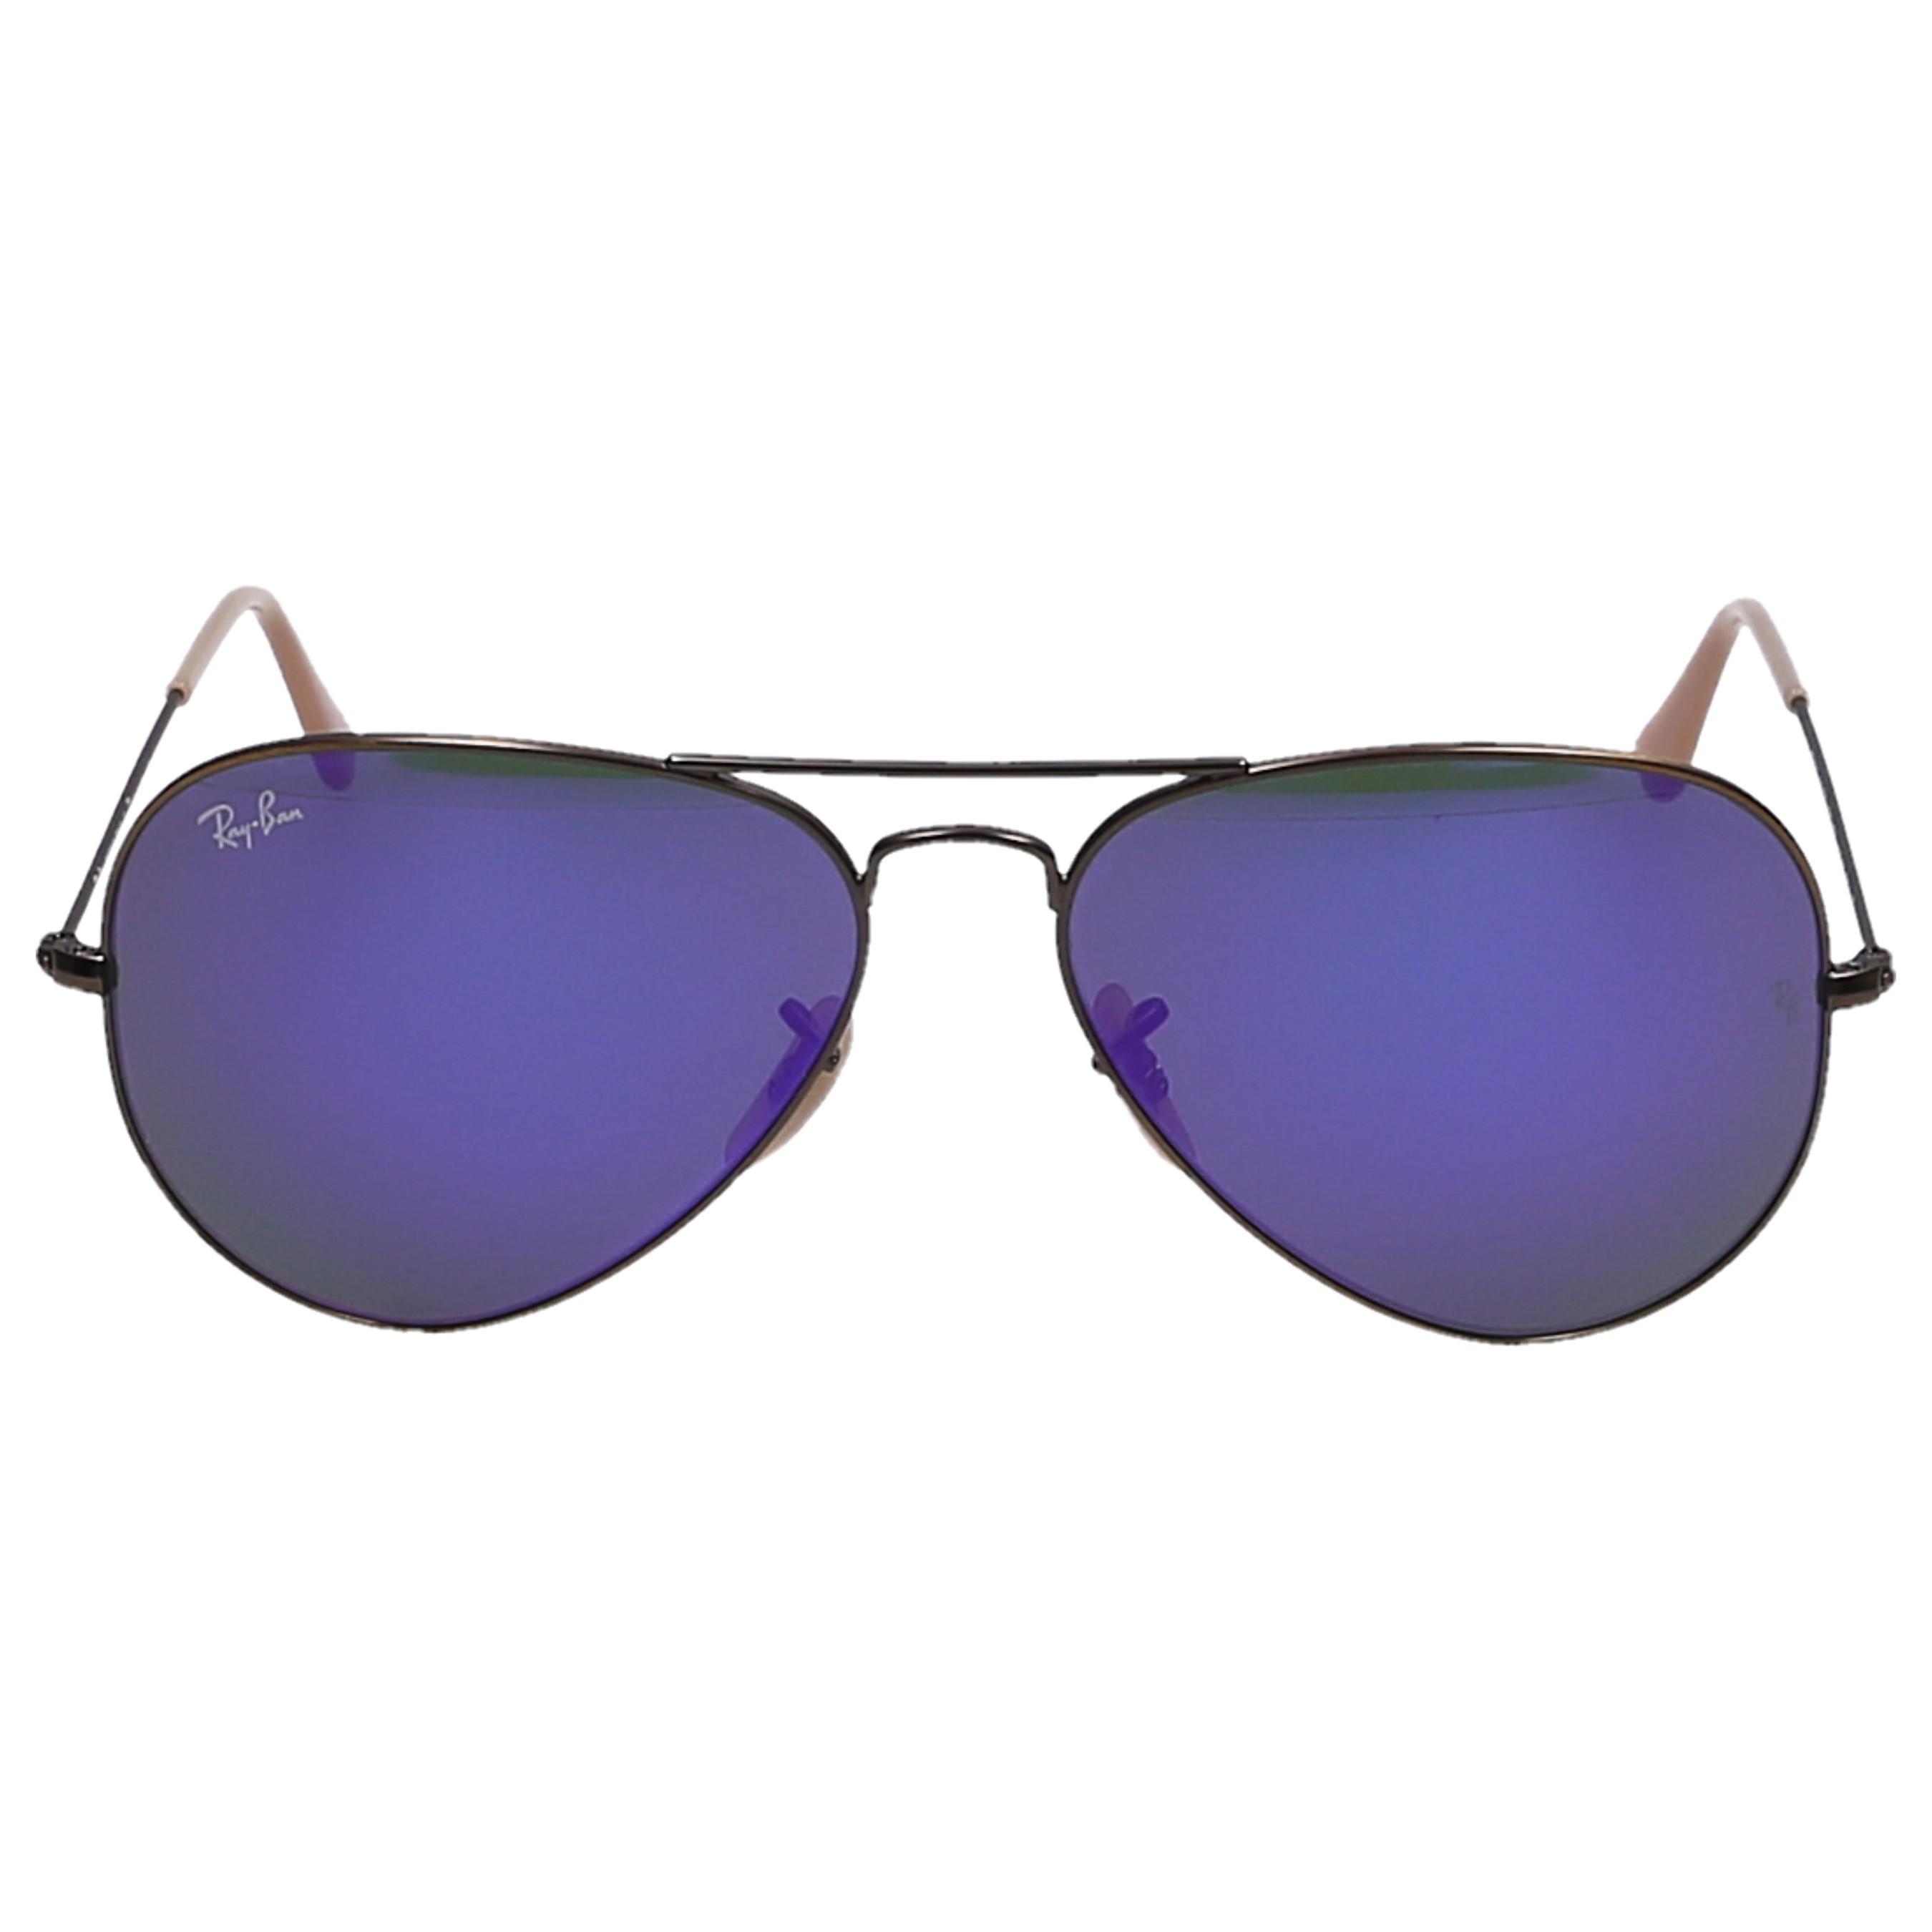 6d7203fc32c8 Lyst - Ray-Ban Sunglasses Aviator 3025 Metal Bronze in Green for Men